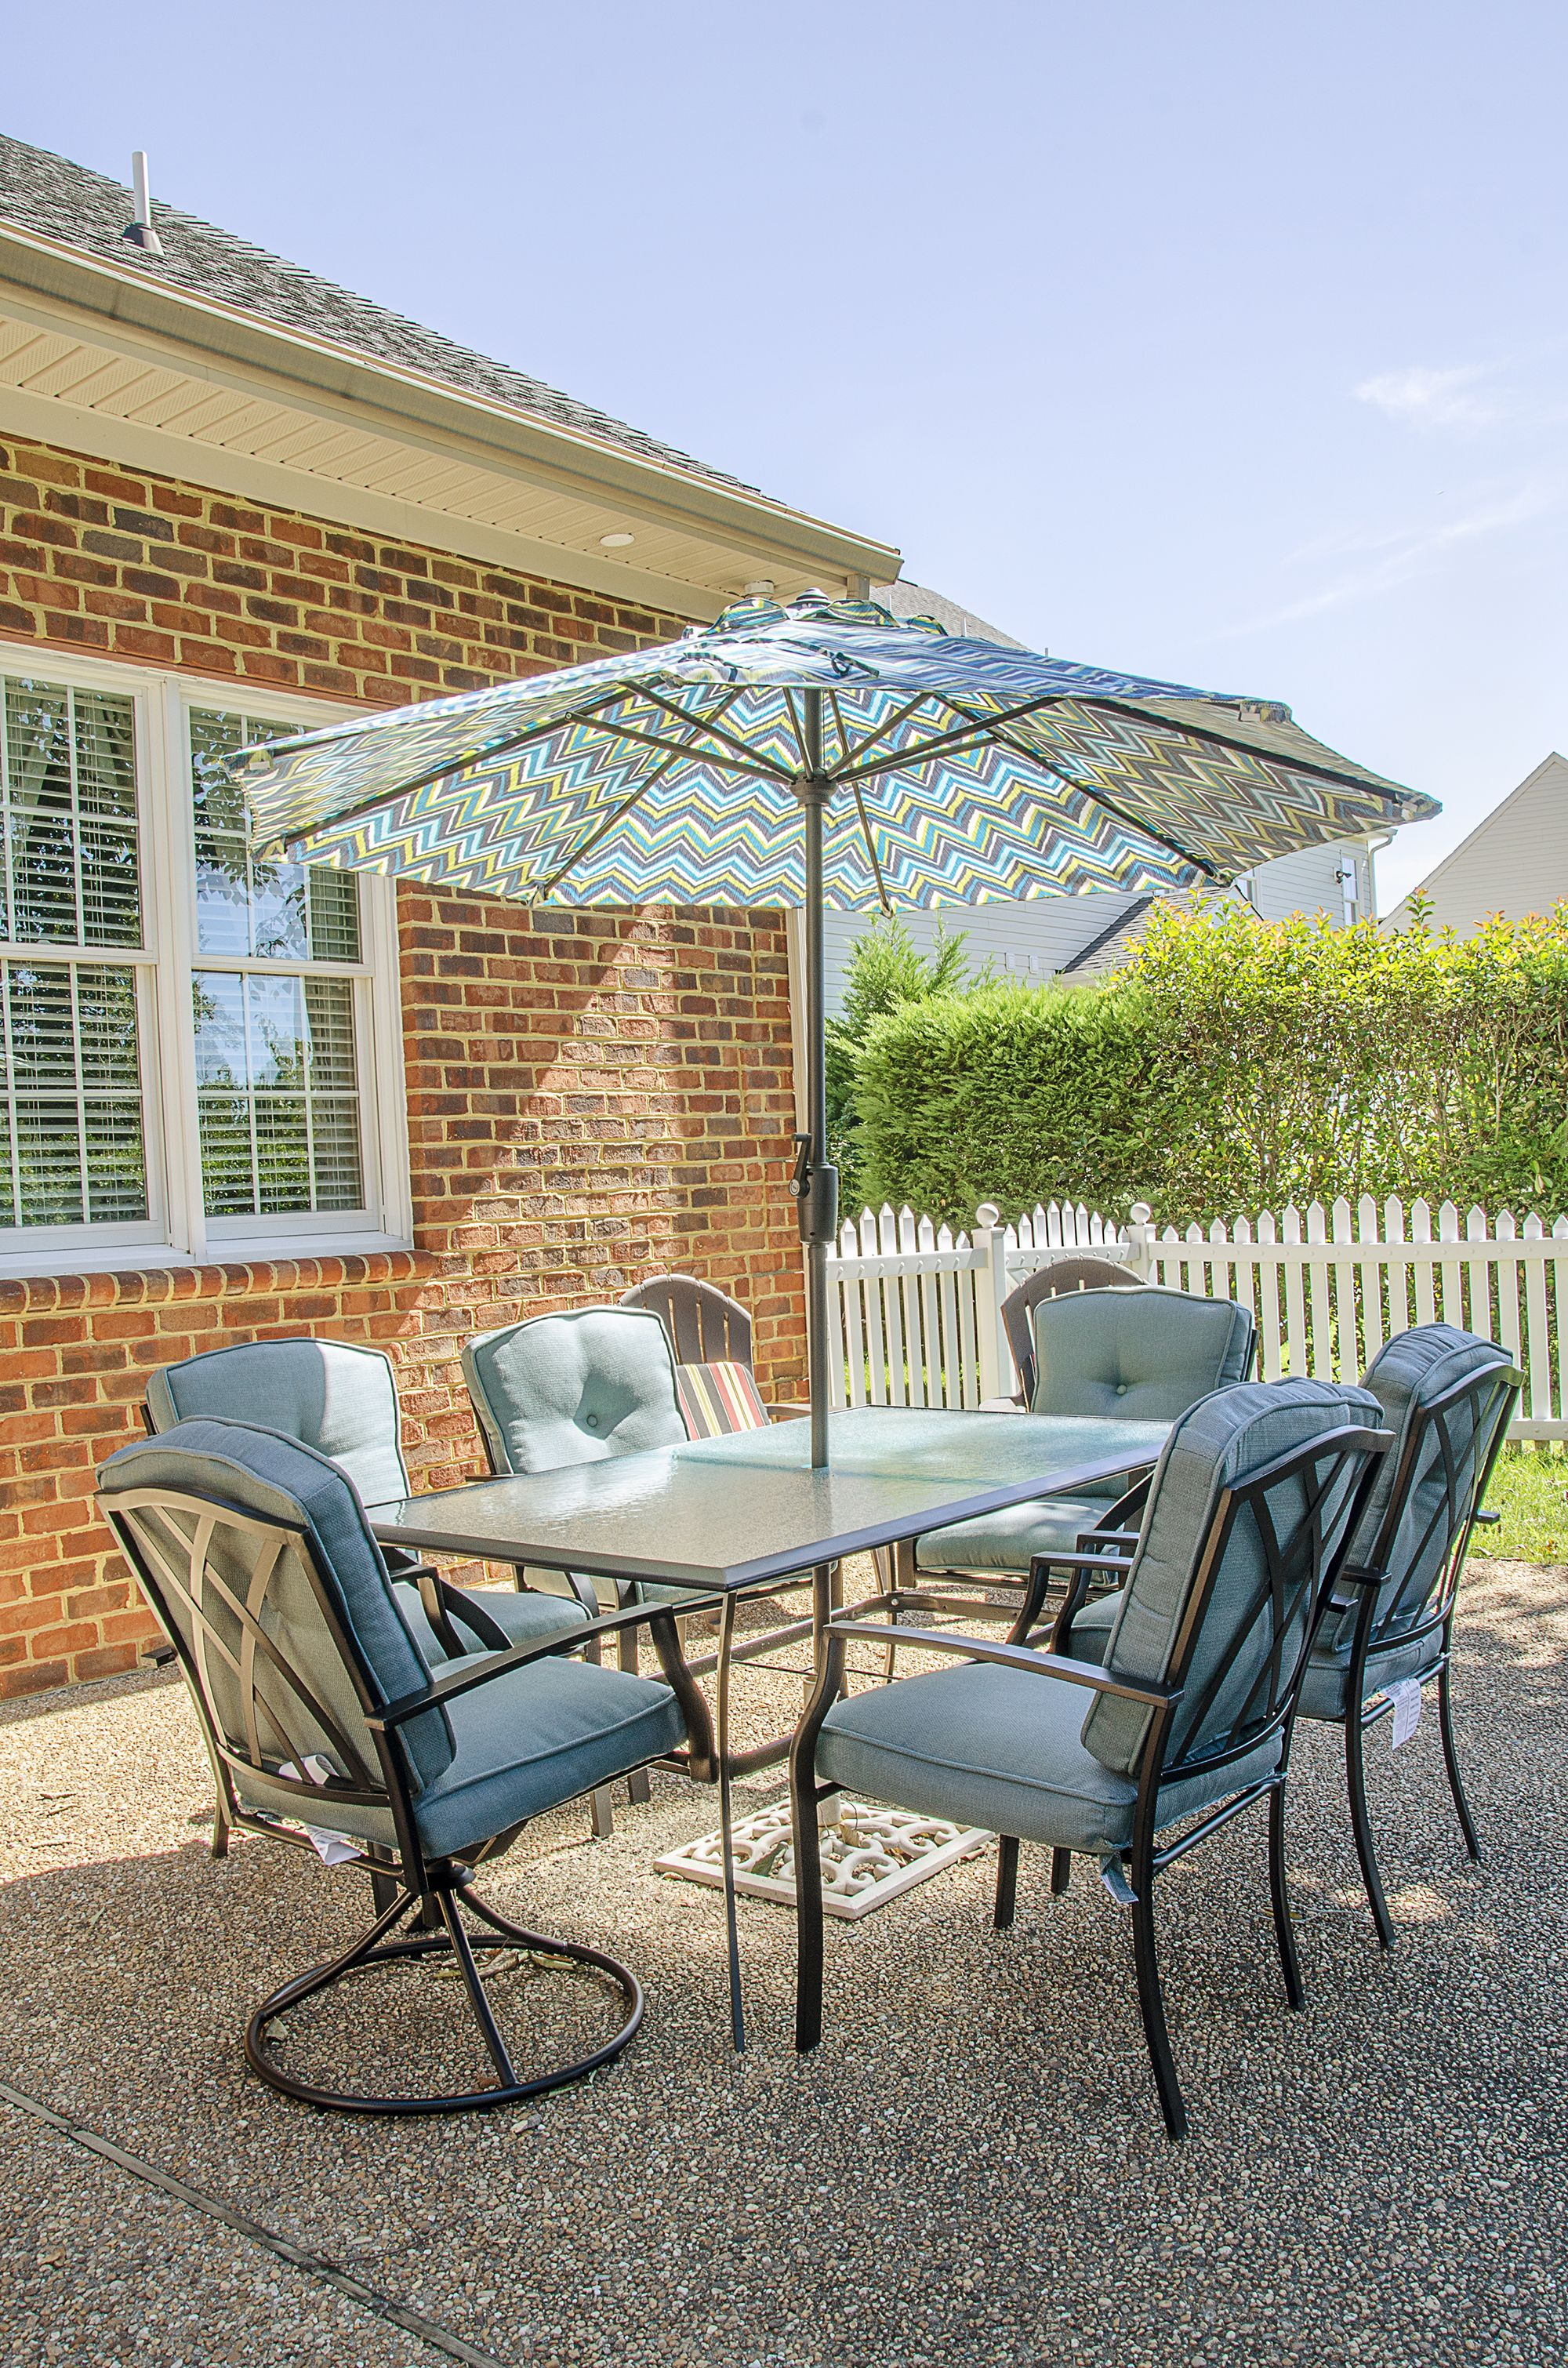 outdoor living patio set up by balducci exteriors balducci rh pinterest ca